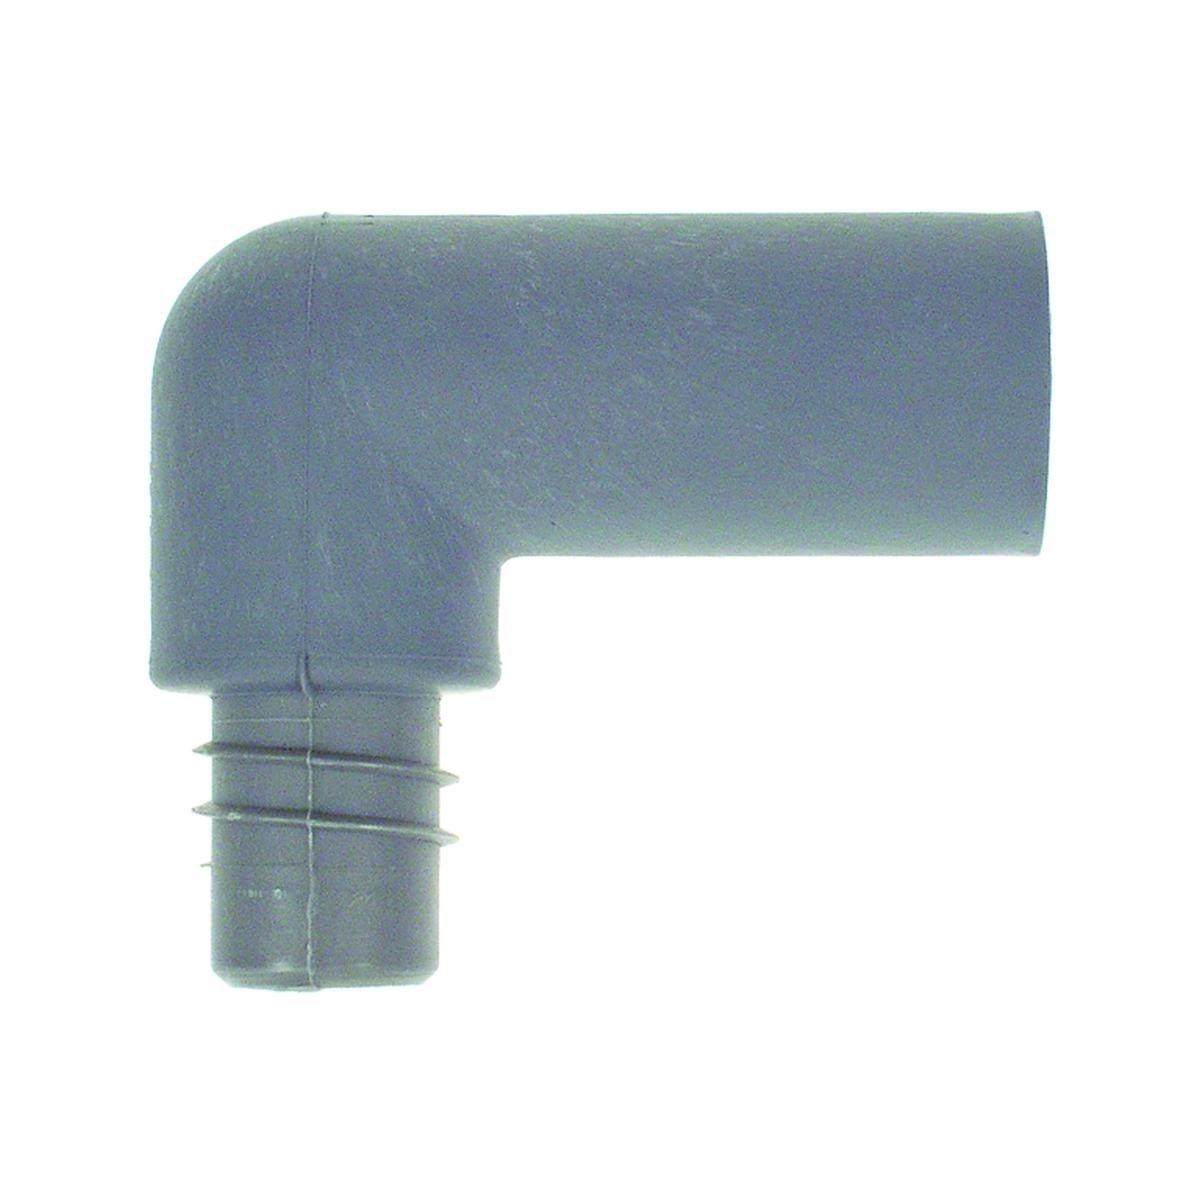 Gummimuffe vinkel Ø22 mm.